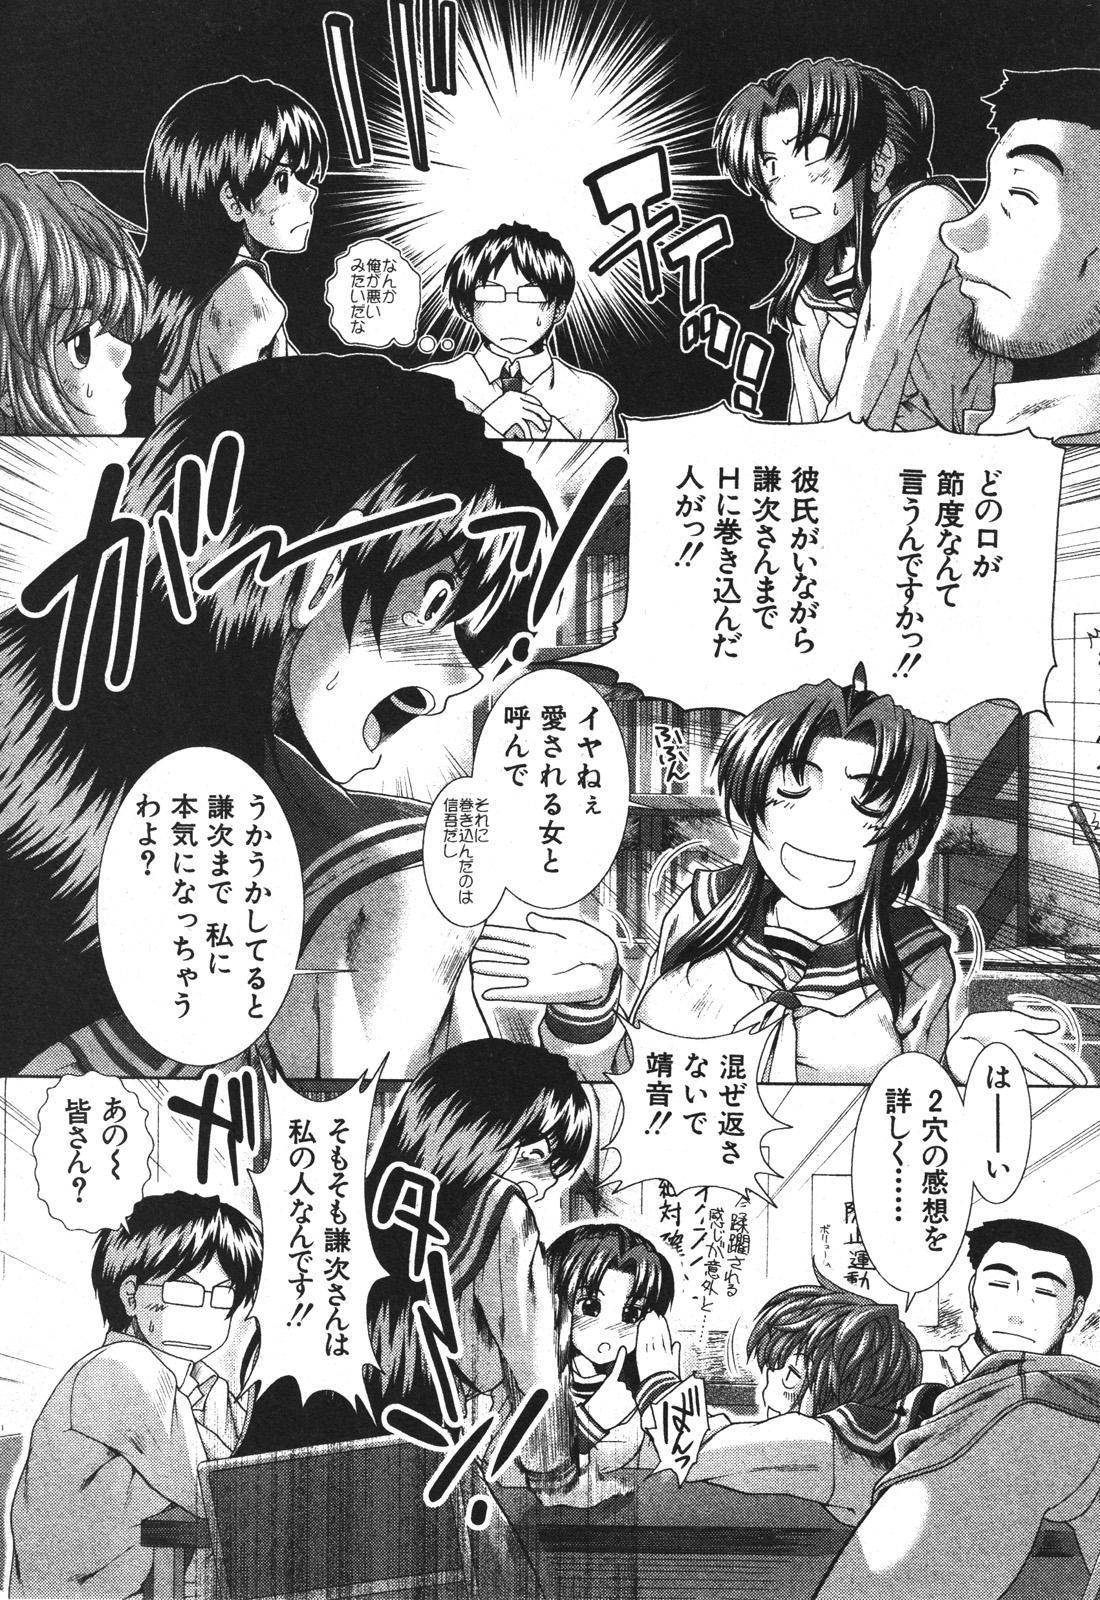 BUSTER COMIC 2010-05 Vol.07 253